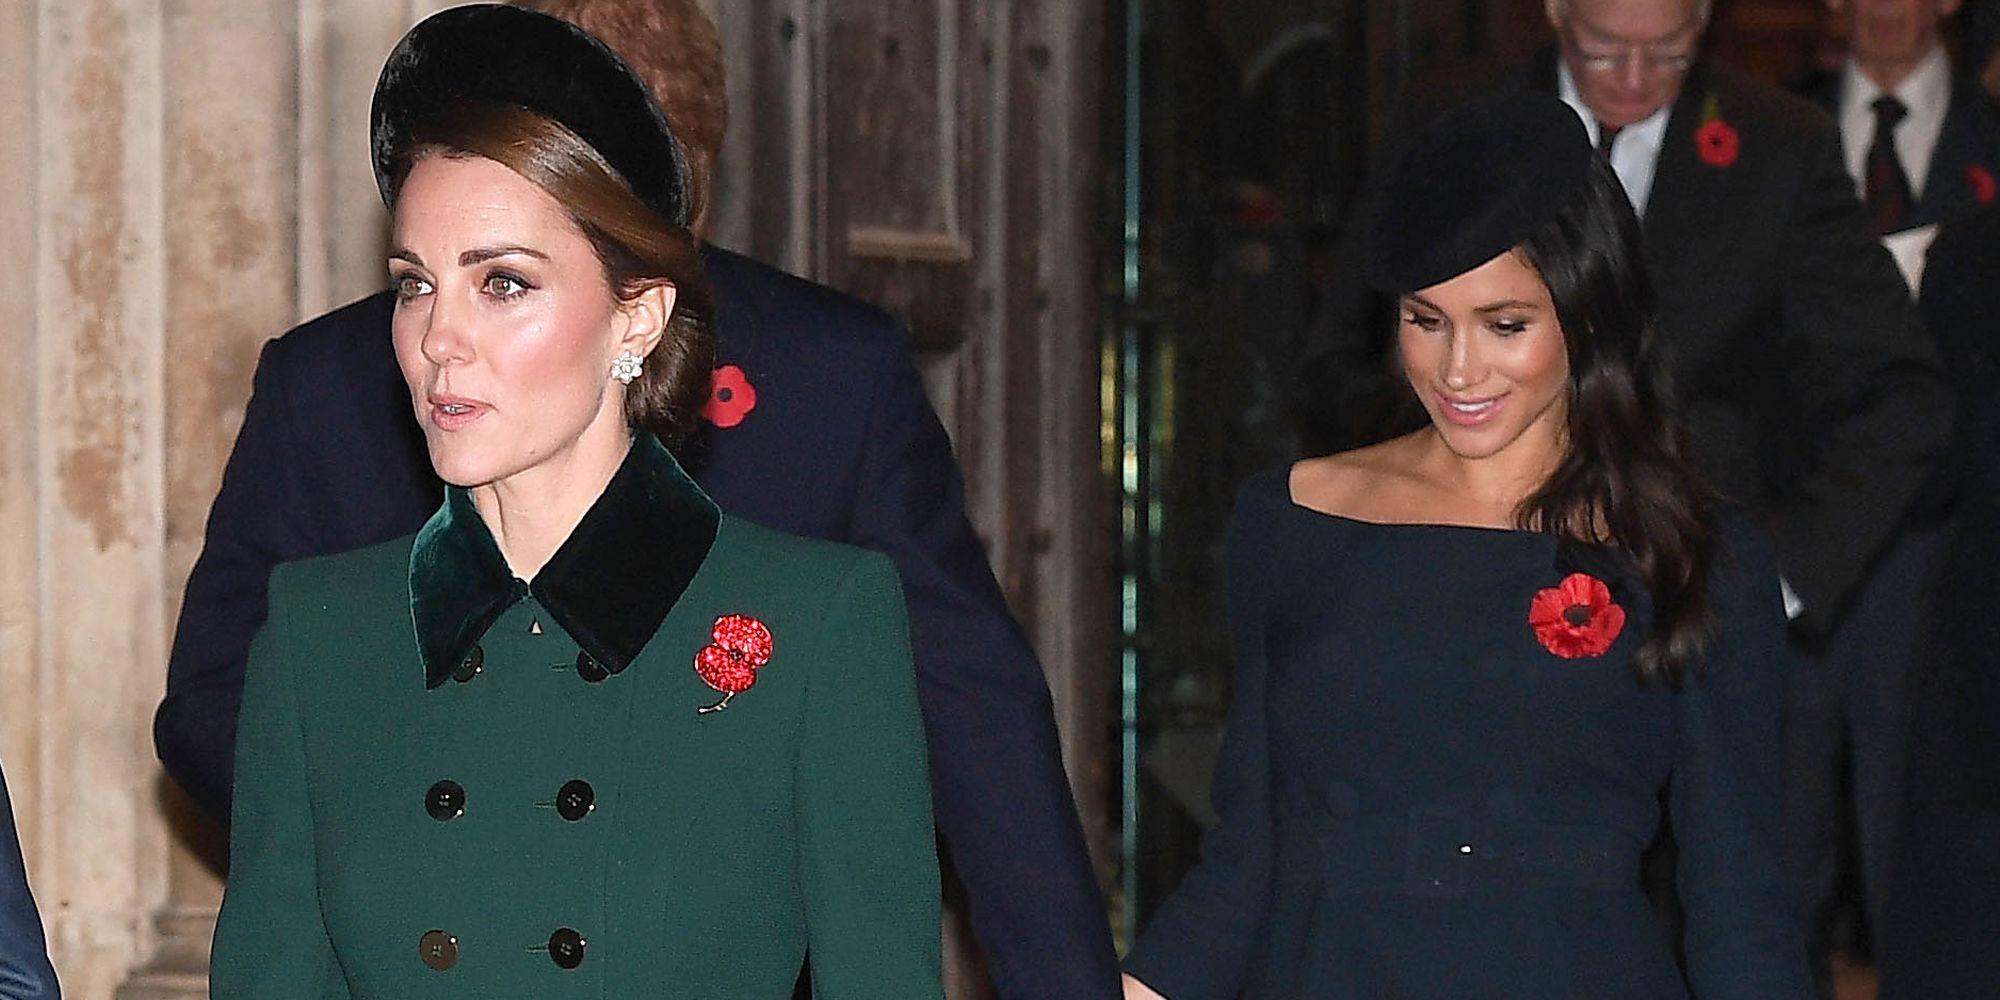 Kate Middleton batte la popolarità di Meghan Markle, ecco perché